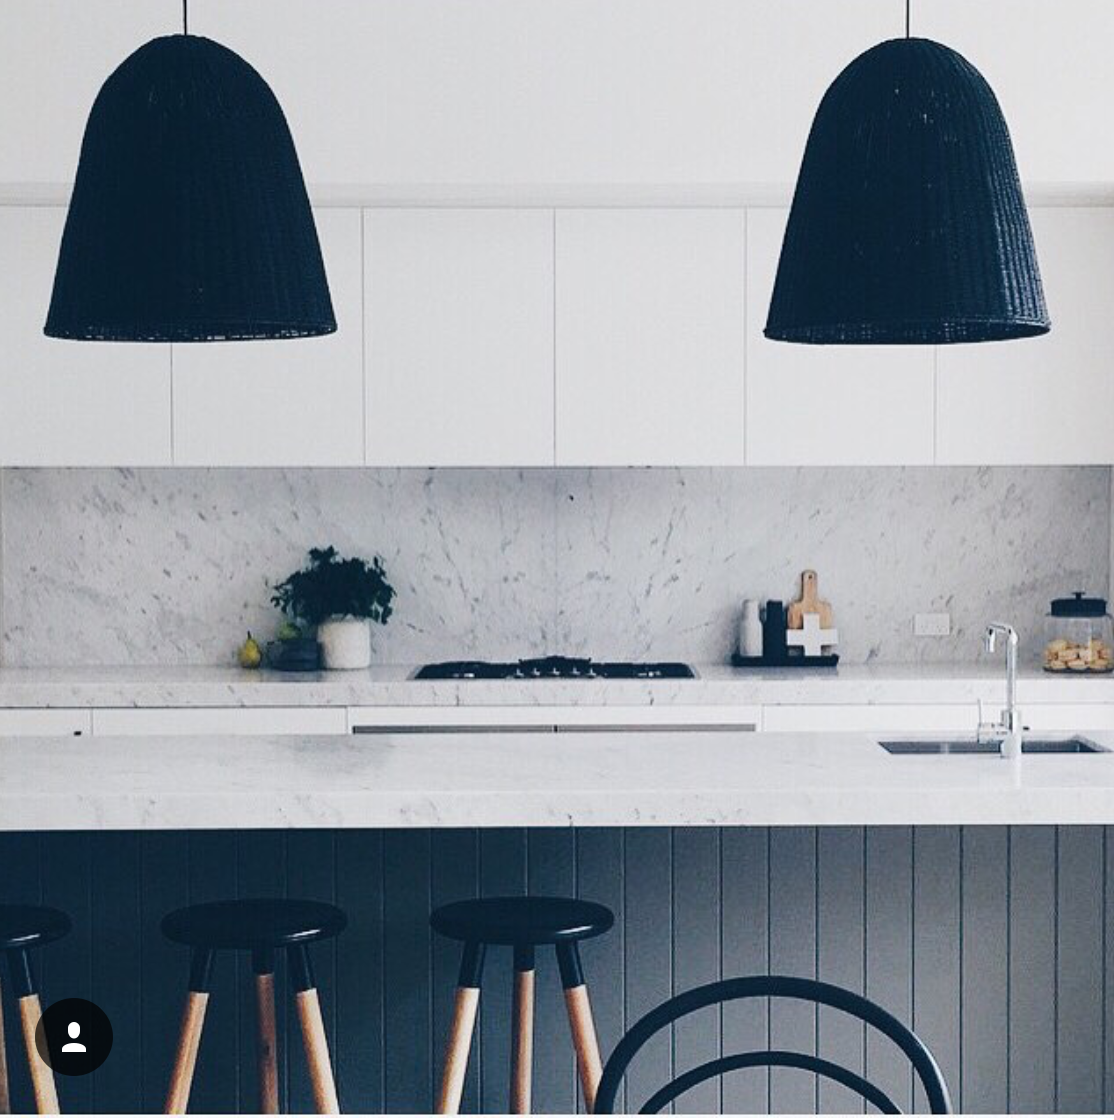 minimalist monochrome kitchen kitchens kitchen kitchen design kitchen lighting. Black Bedroom Furniture Sets. Home Design Ideas